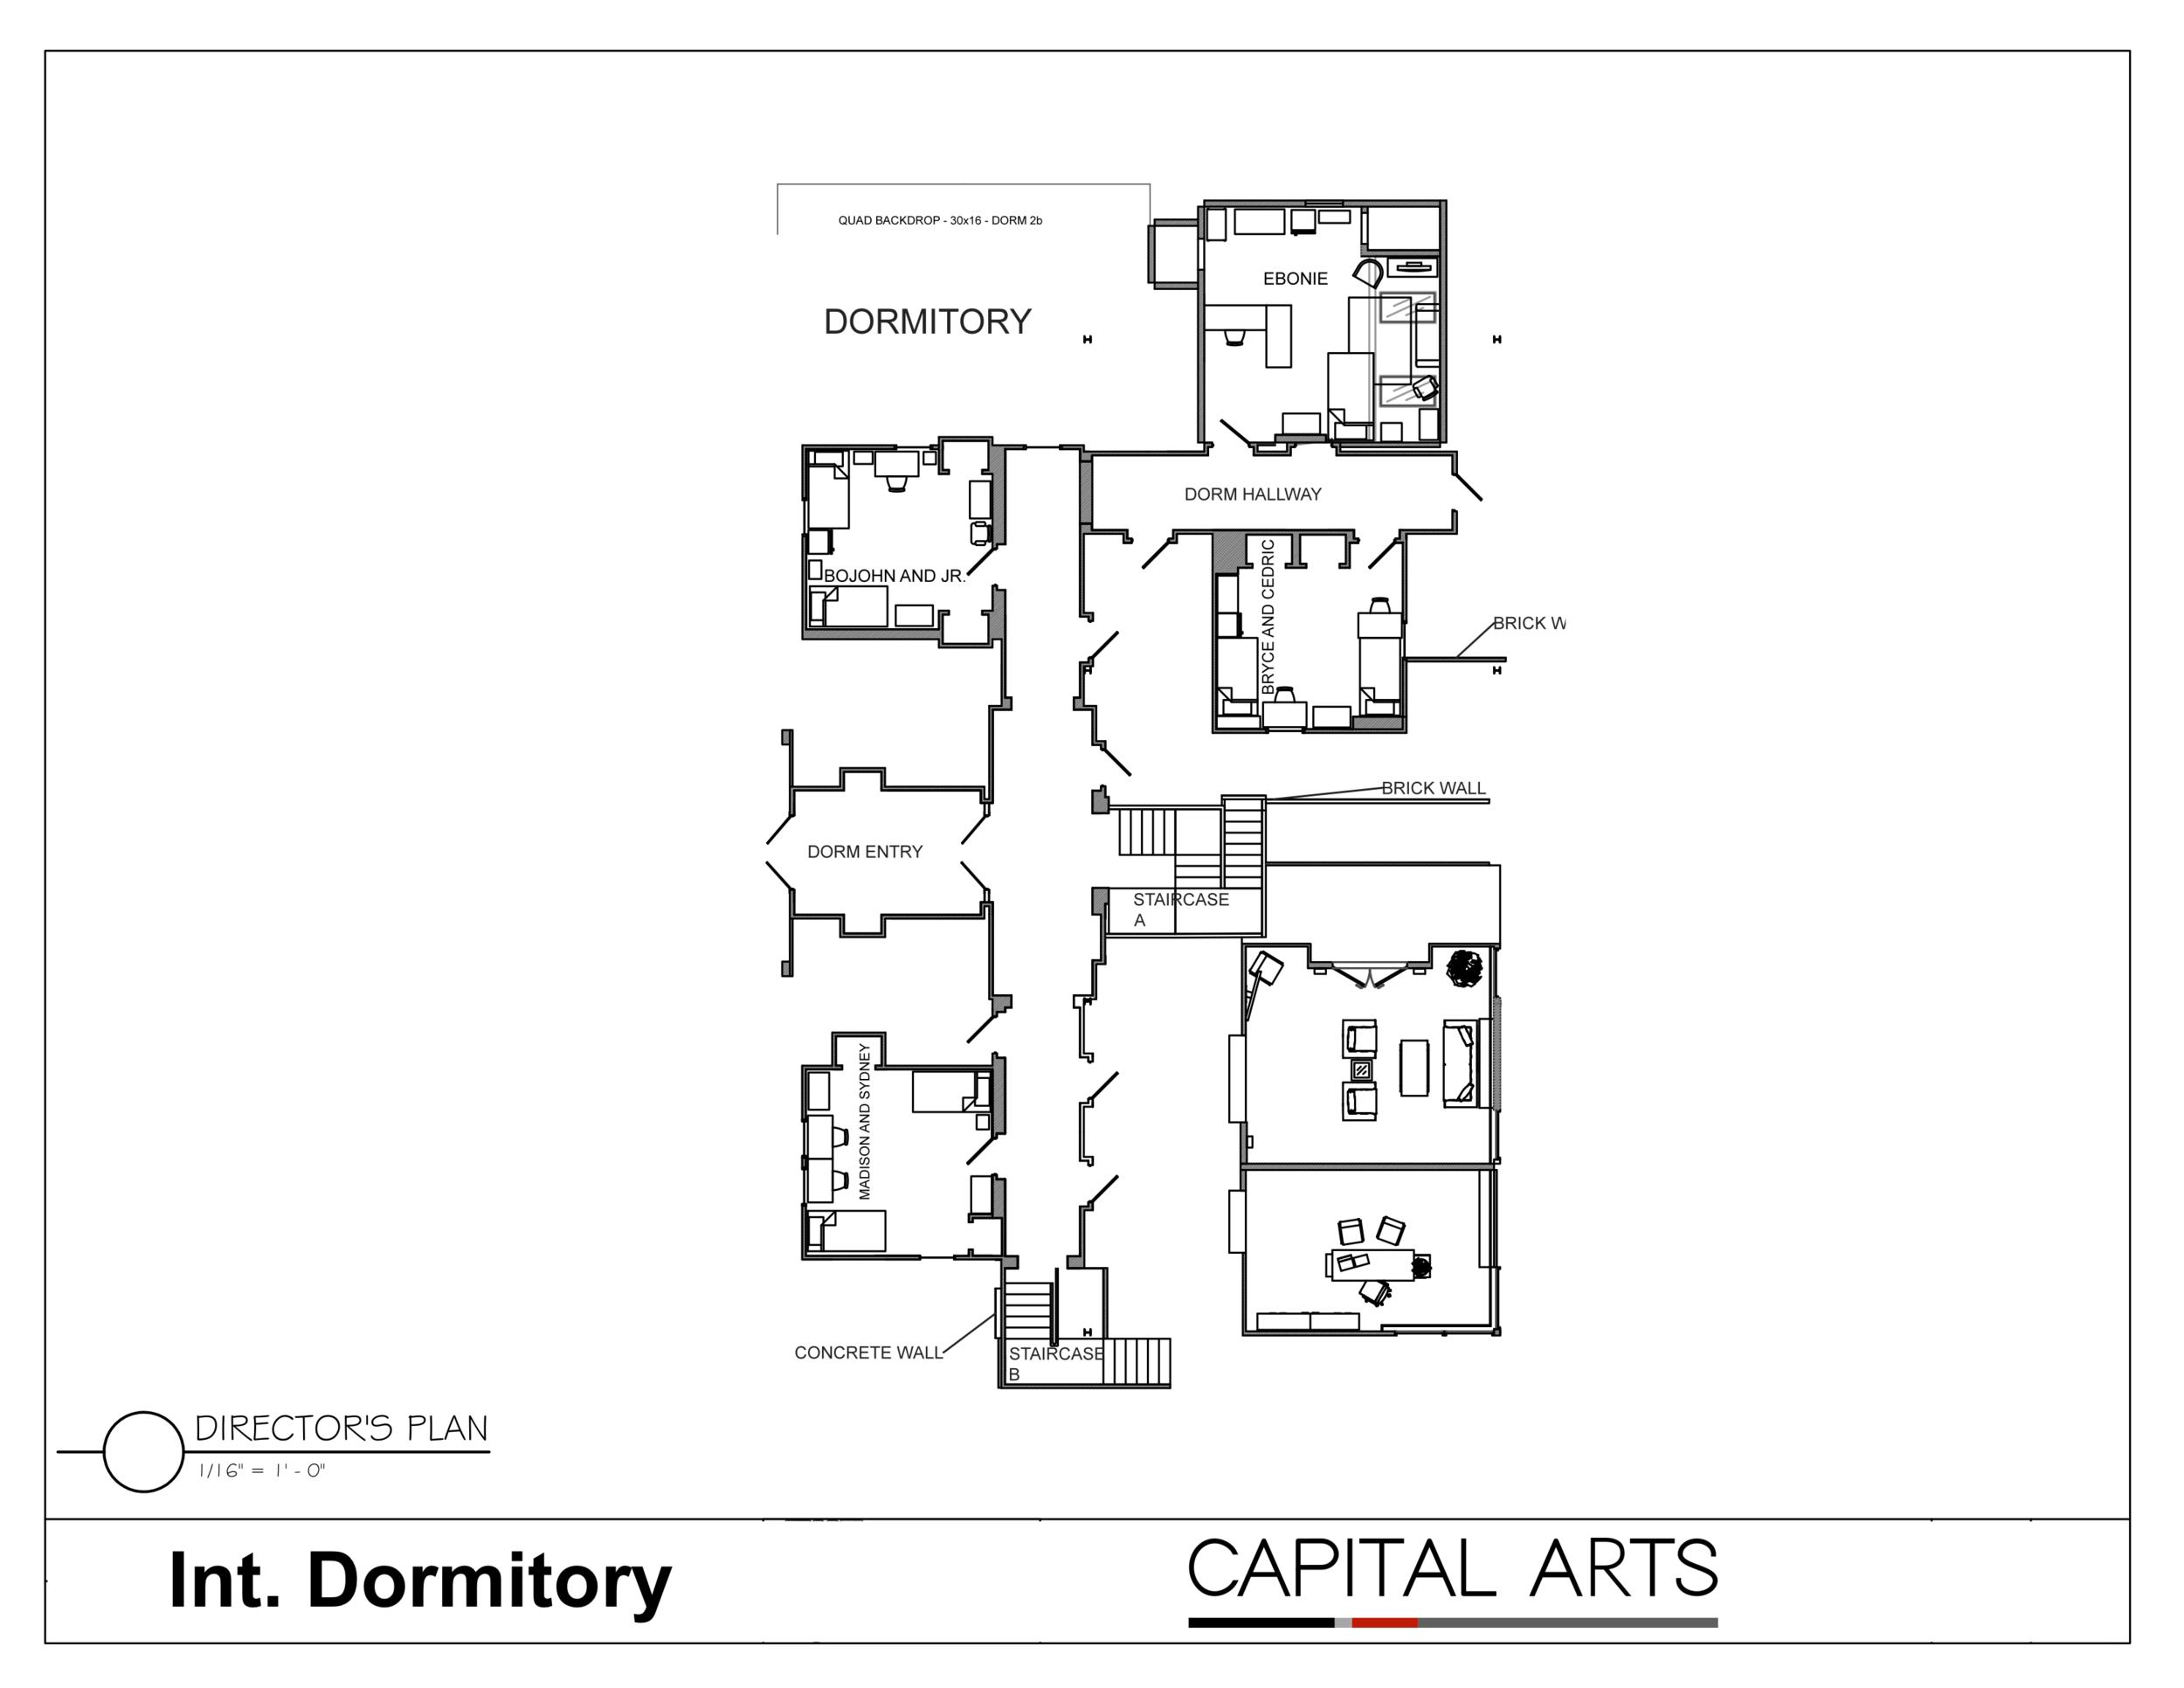 Dorms1.PLAN.8.5x11.png